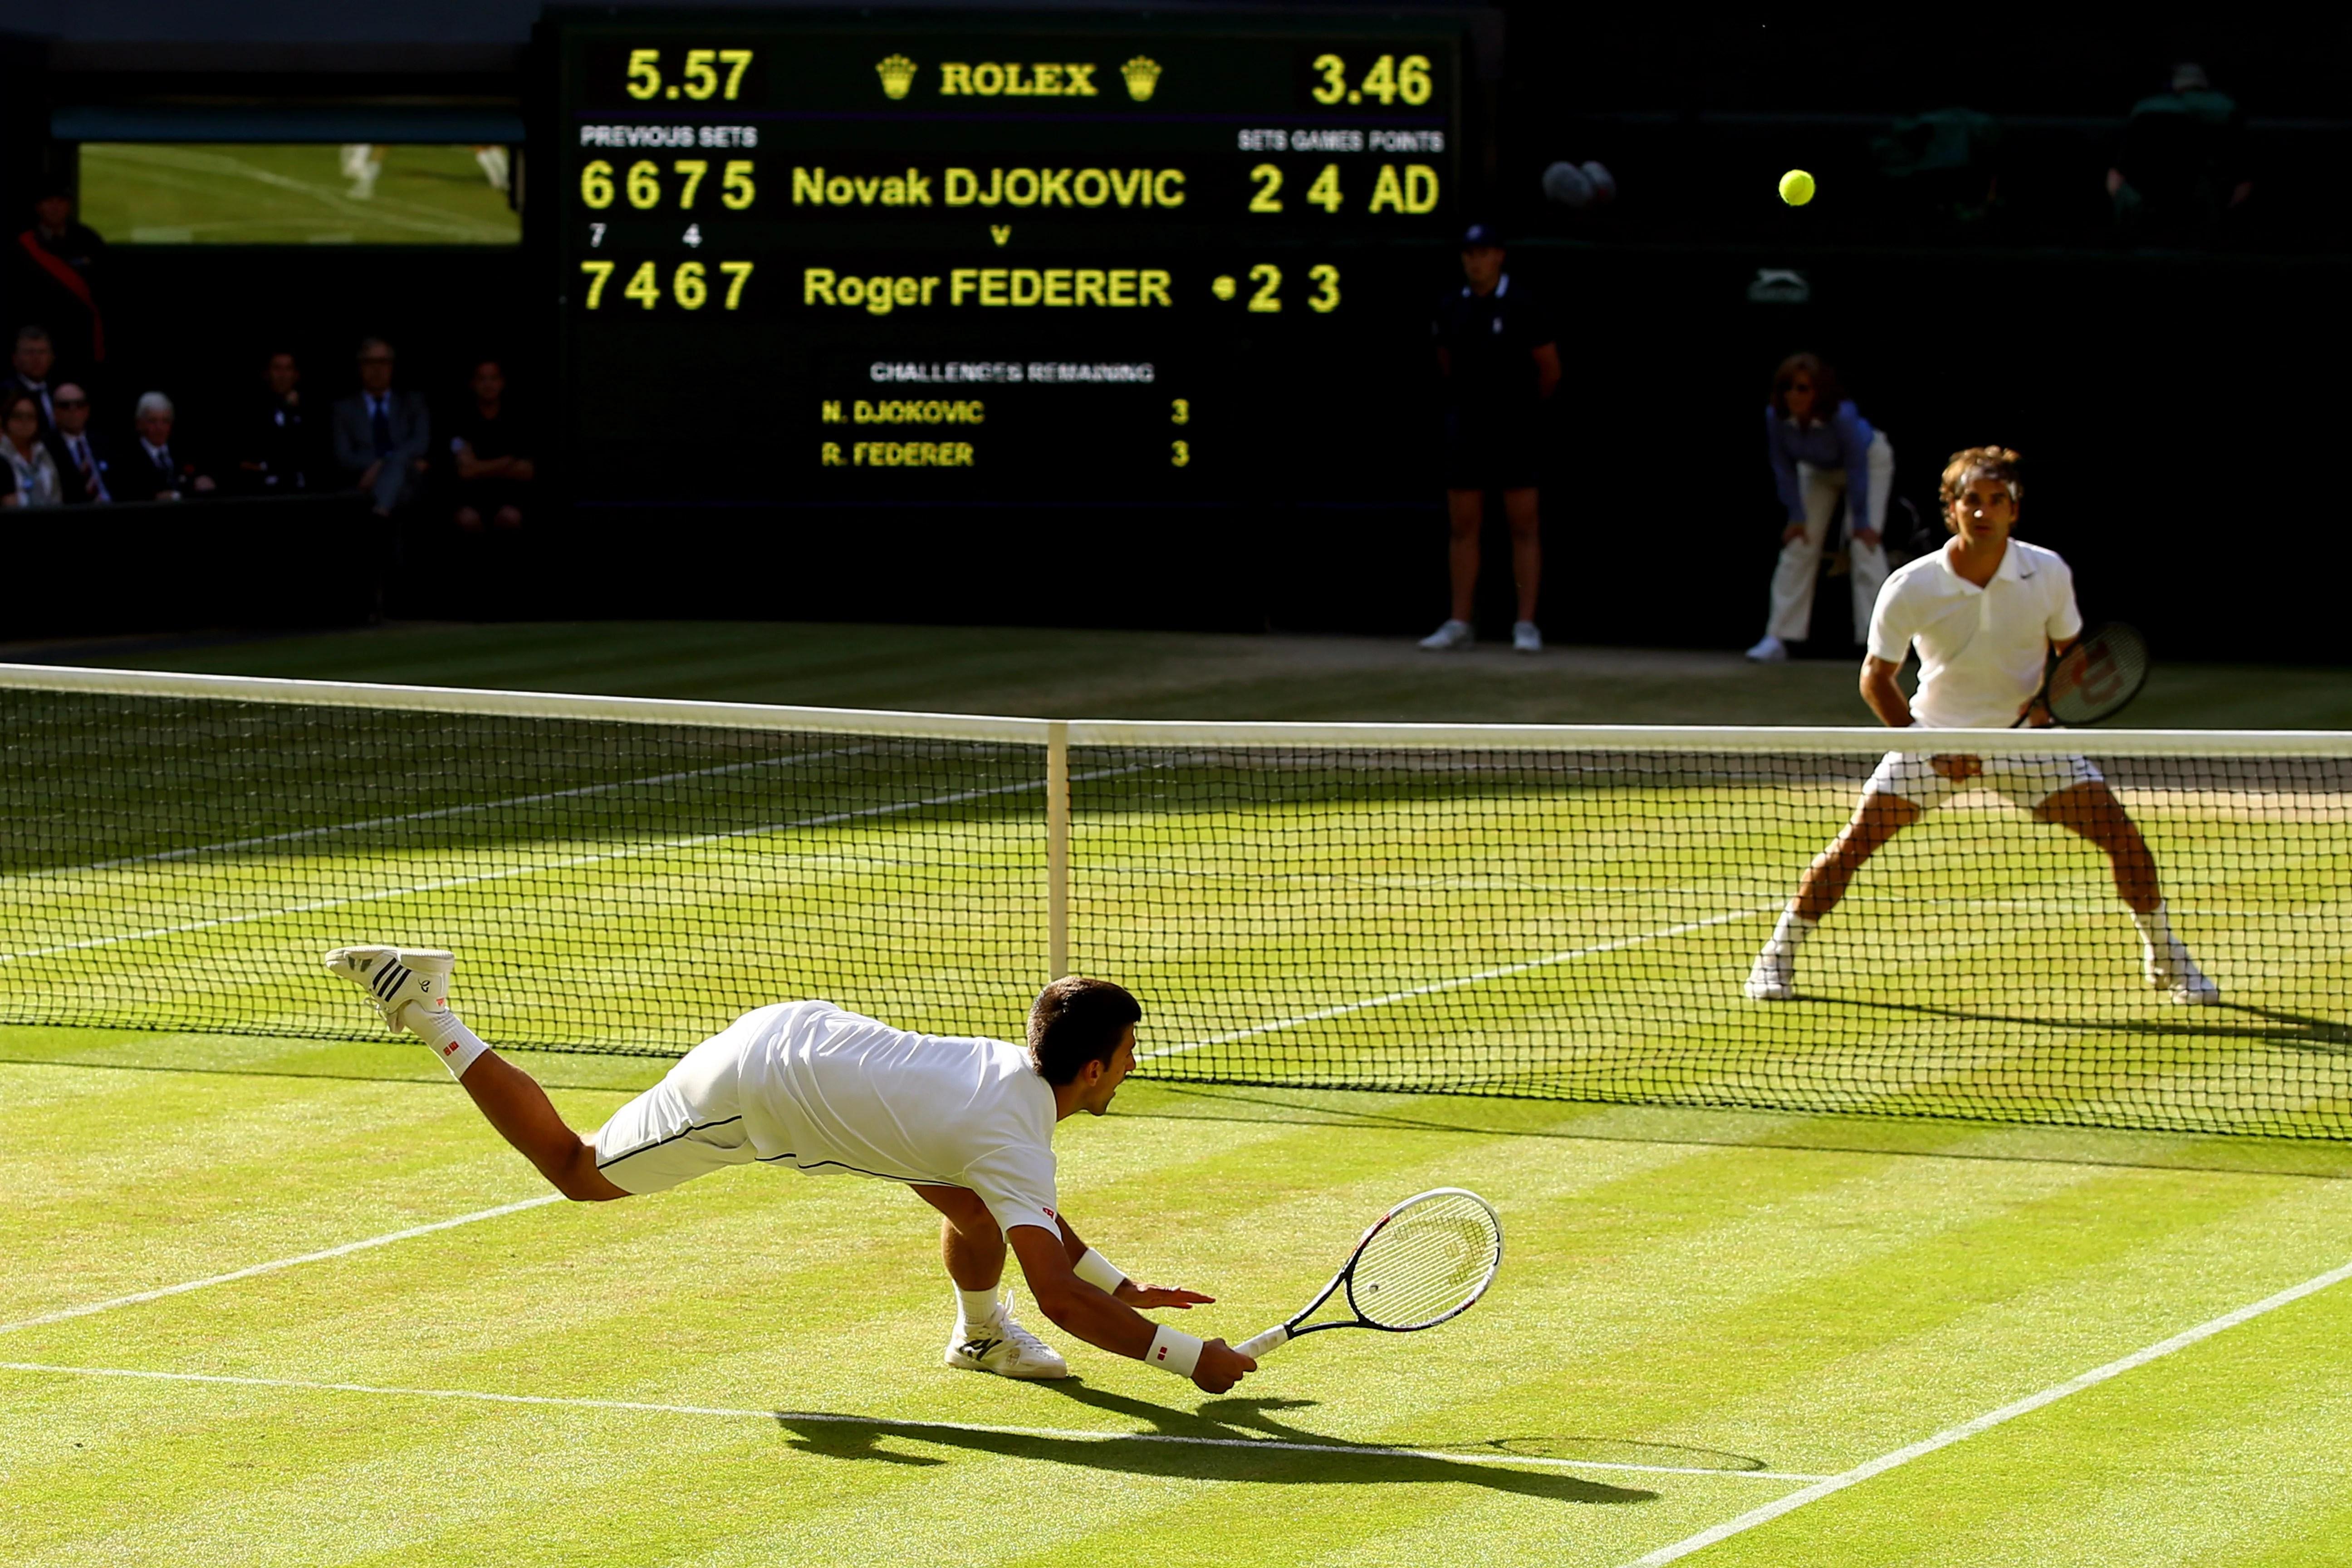 Wimbledon Live Updates